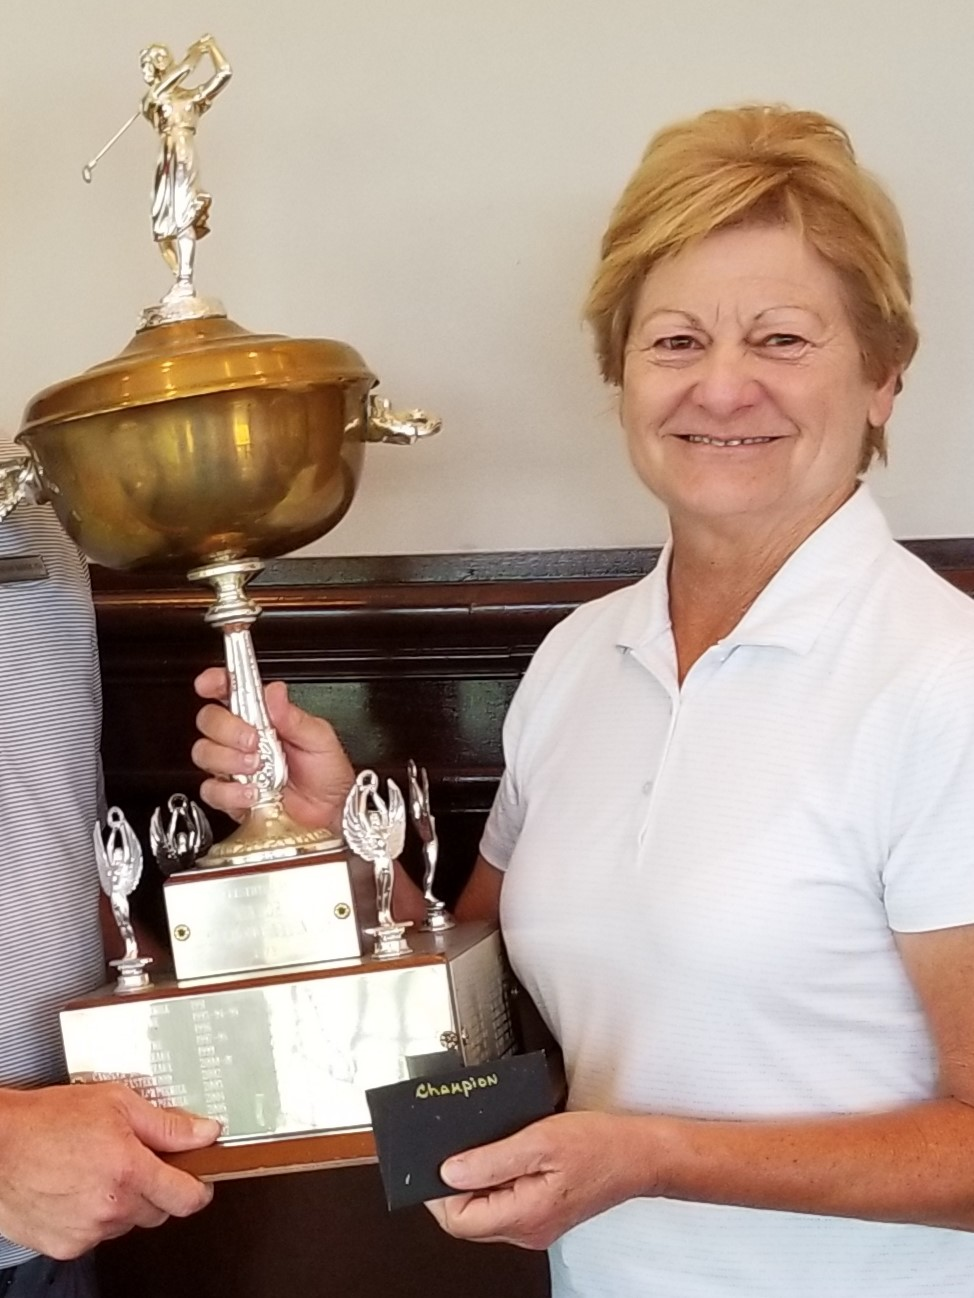 2019 SWGA Champion